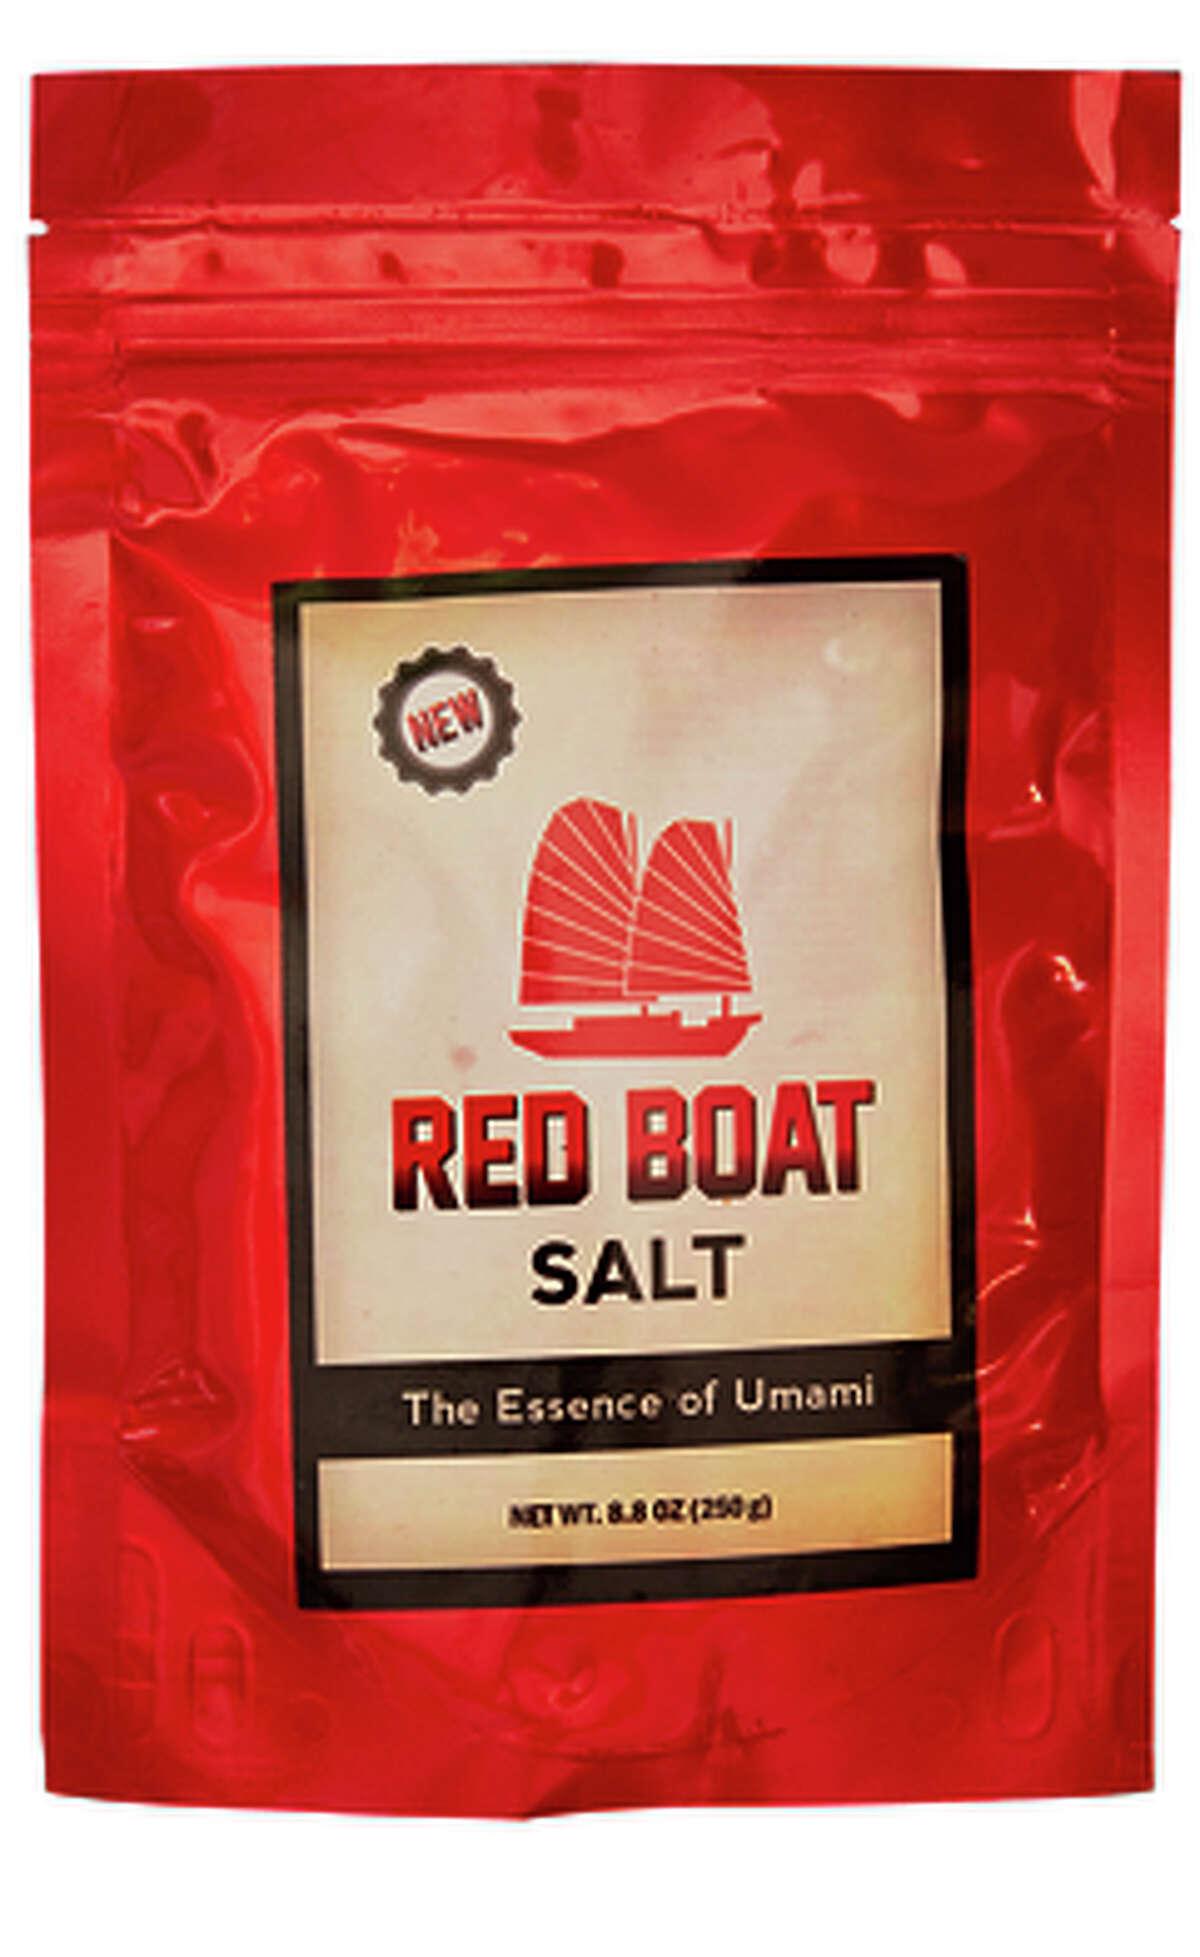 Red Boat Fish Sauce fish salt.